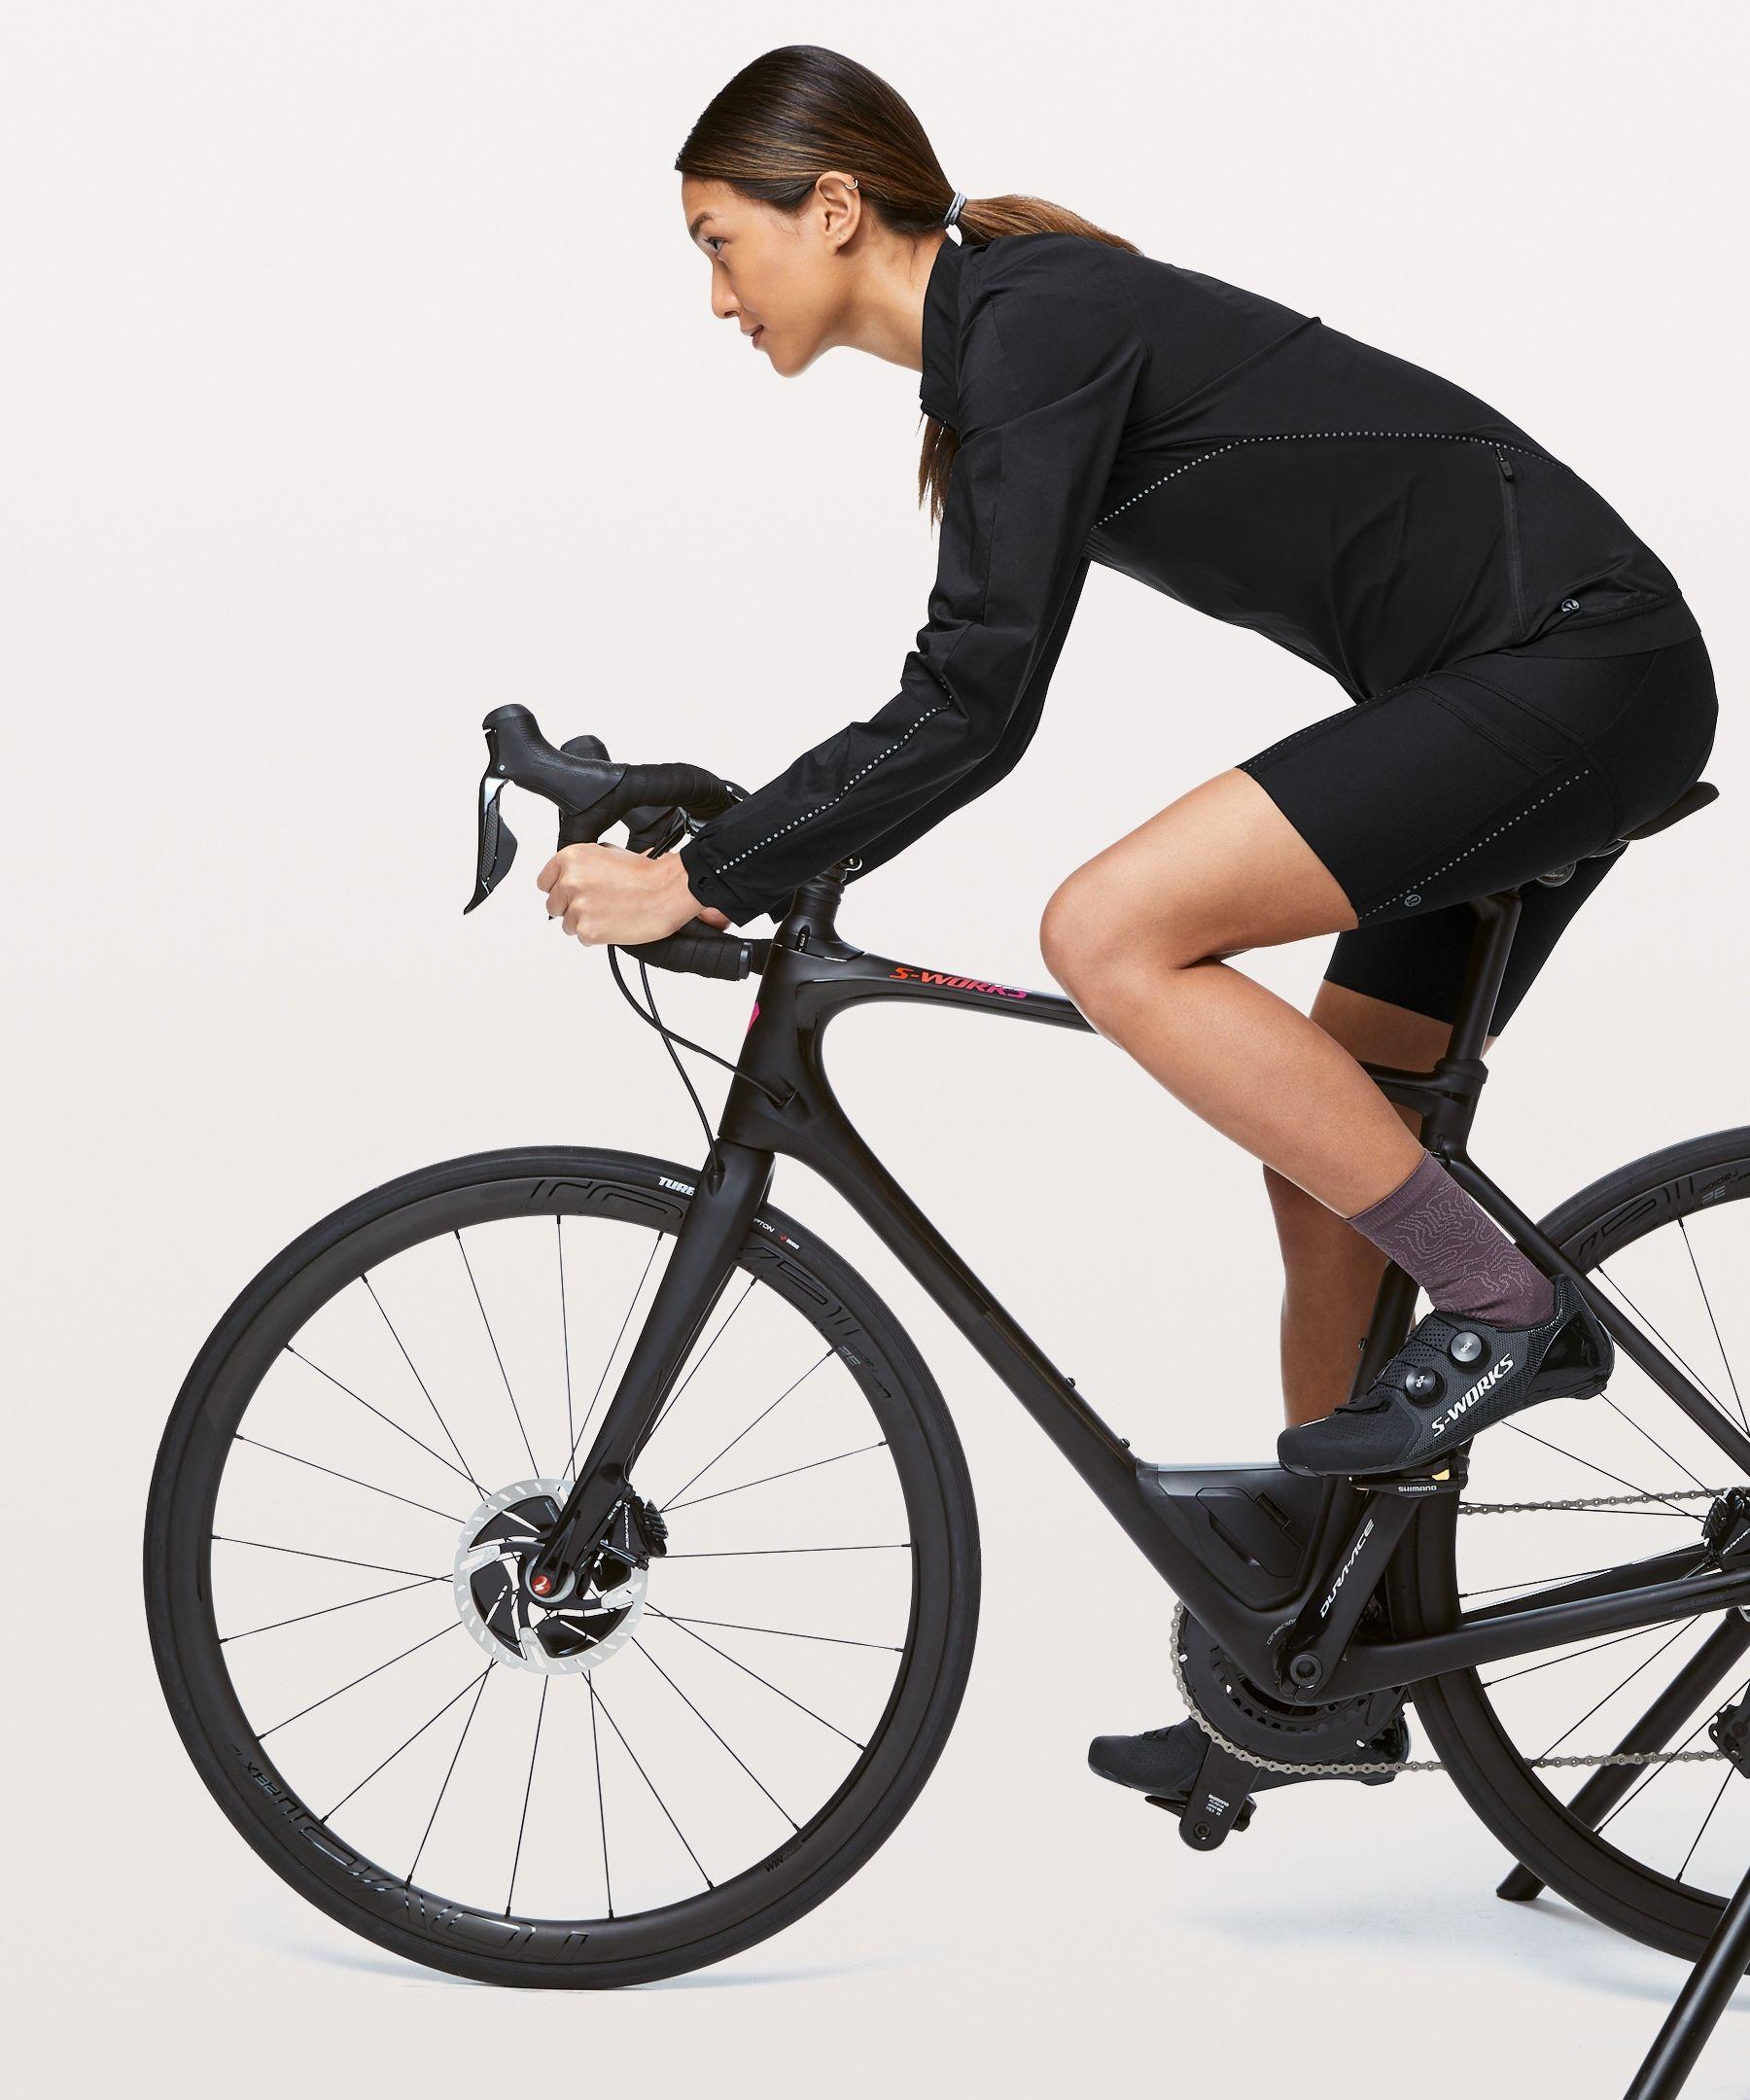 Lululemon Women S City To Summit Cycling Jacket Black Size Xs In 2020 Jackets For Women